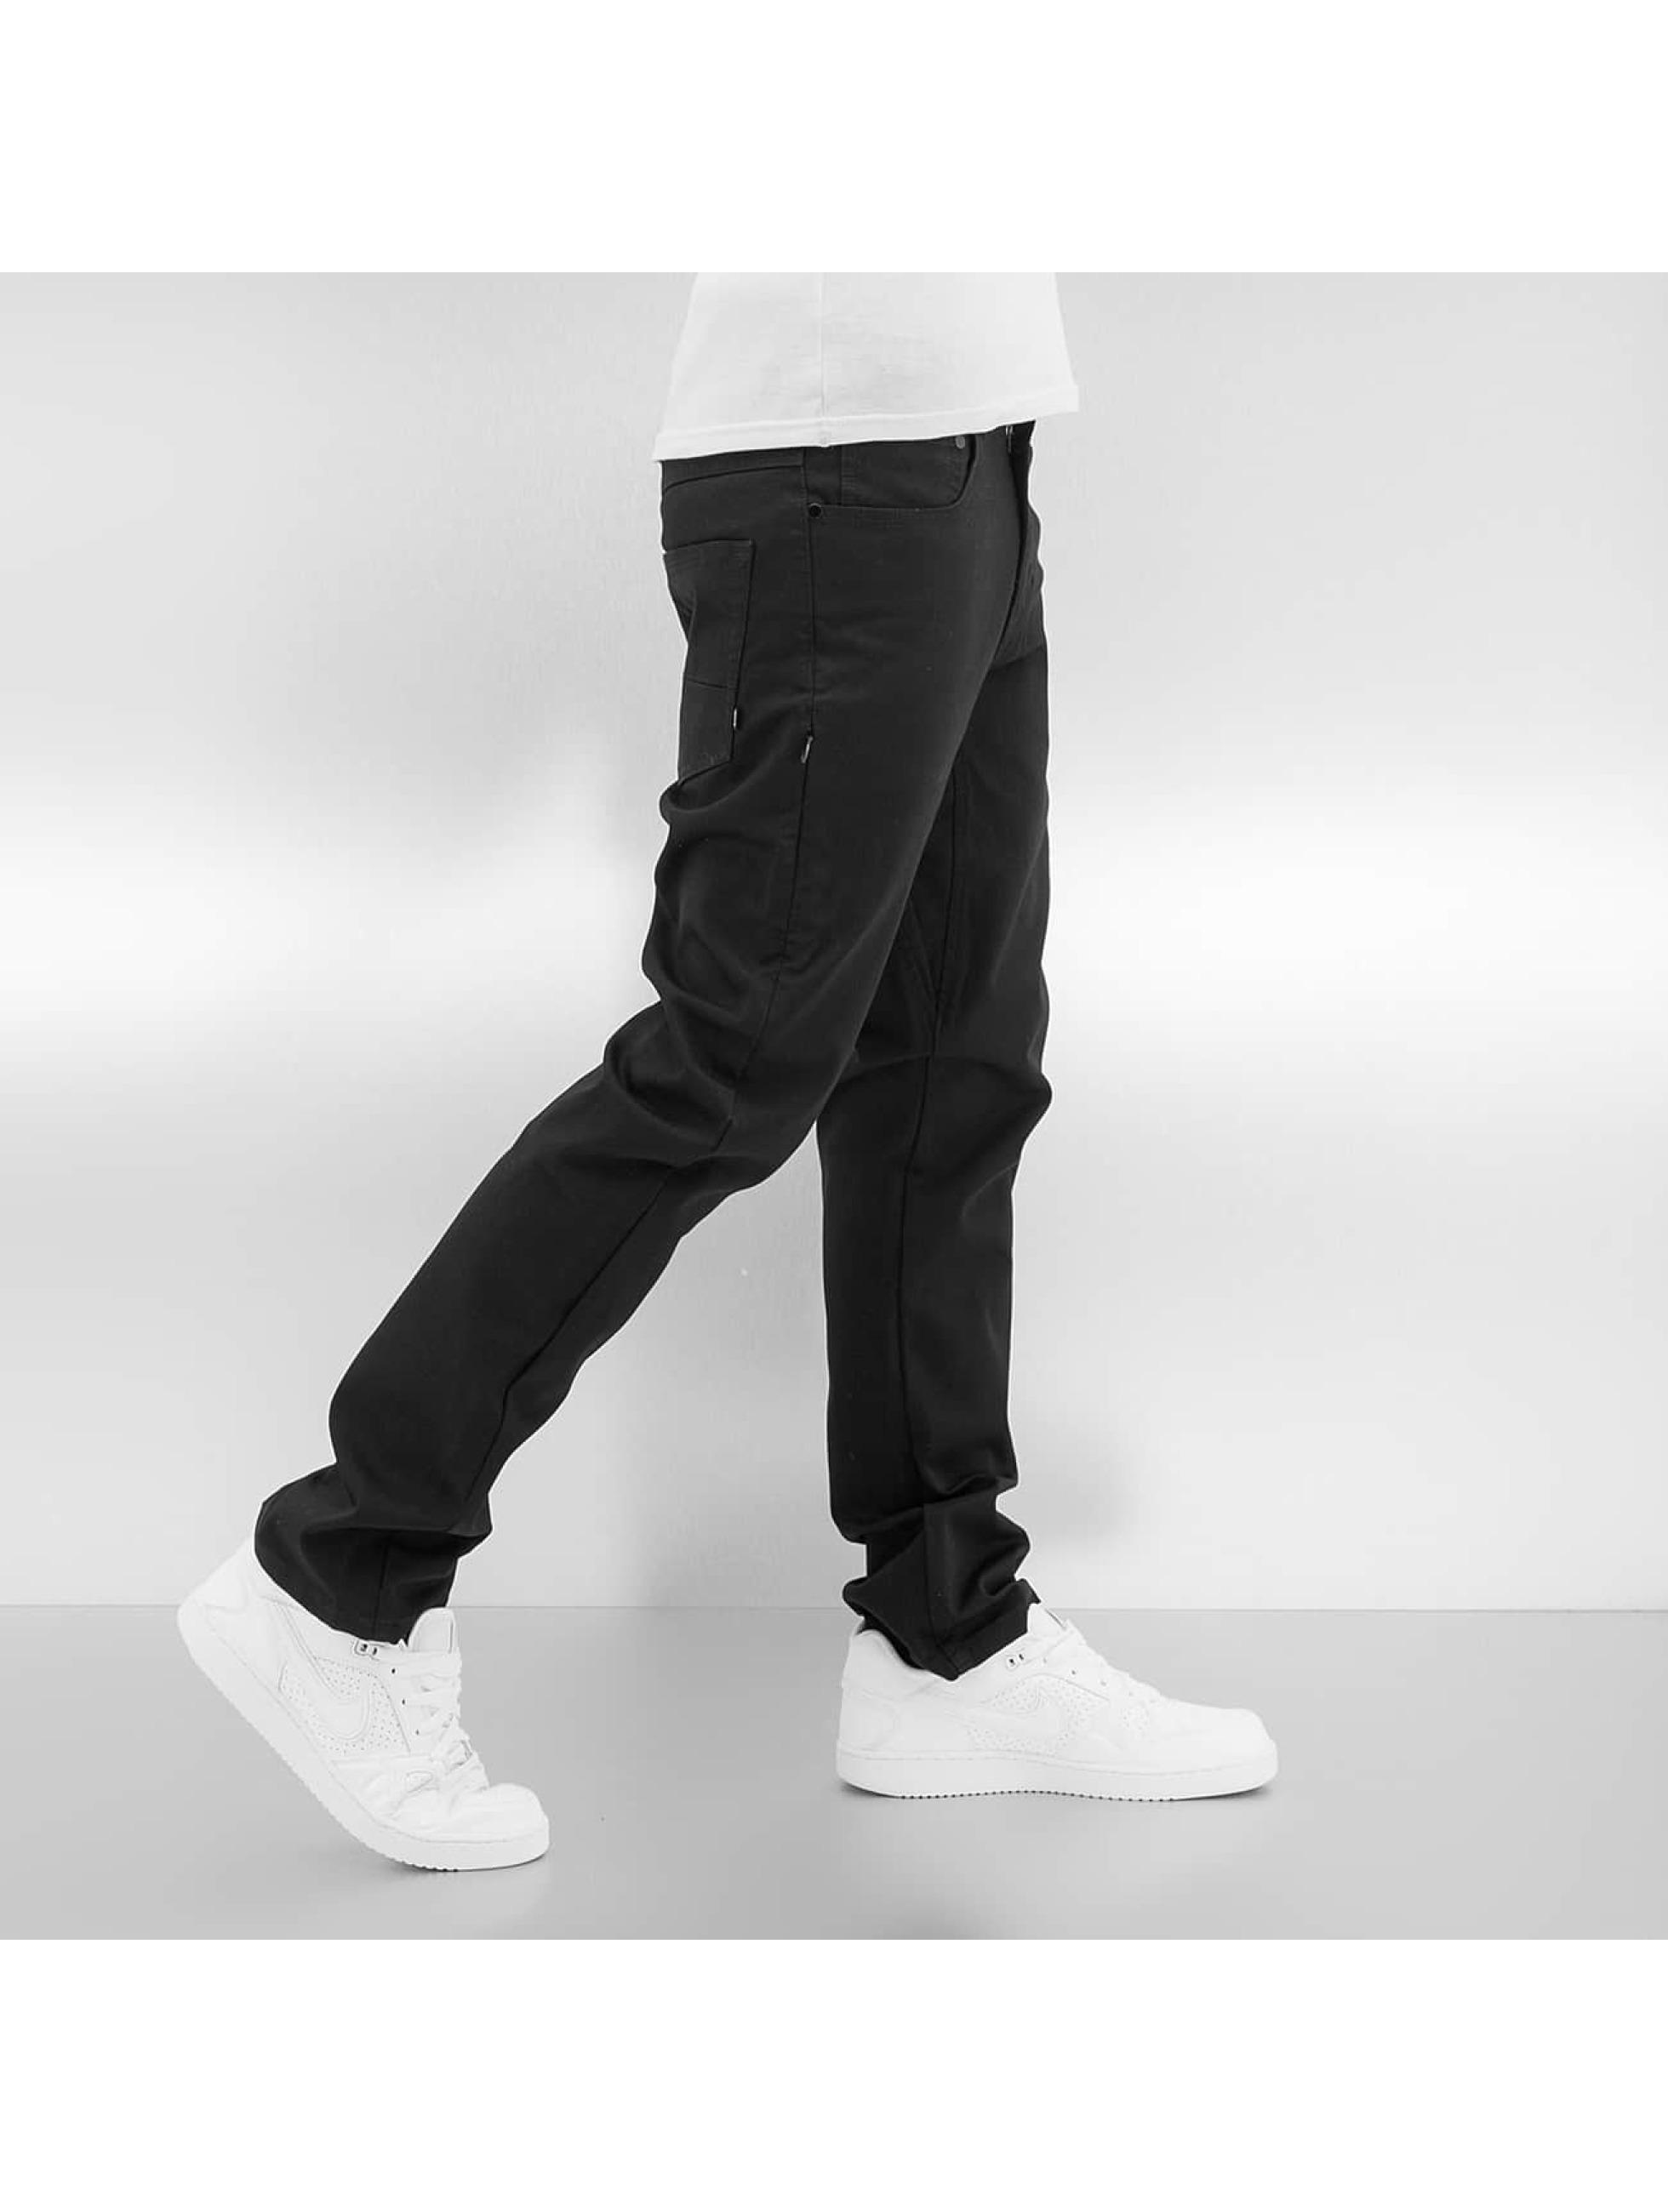 Nike SB Chino SB 5 Pocket schwarz